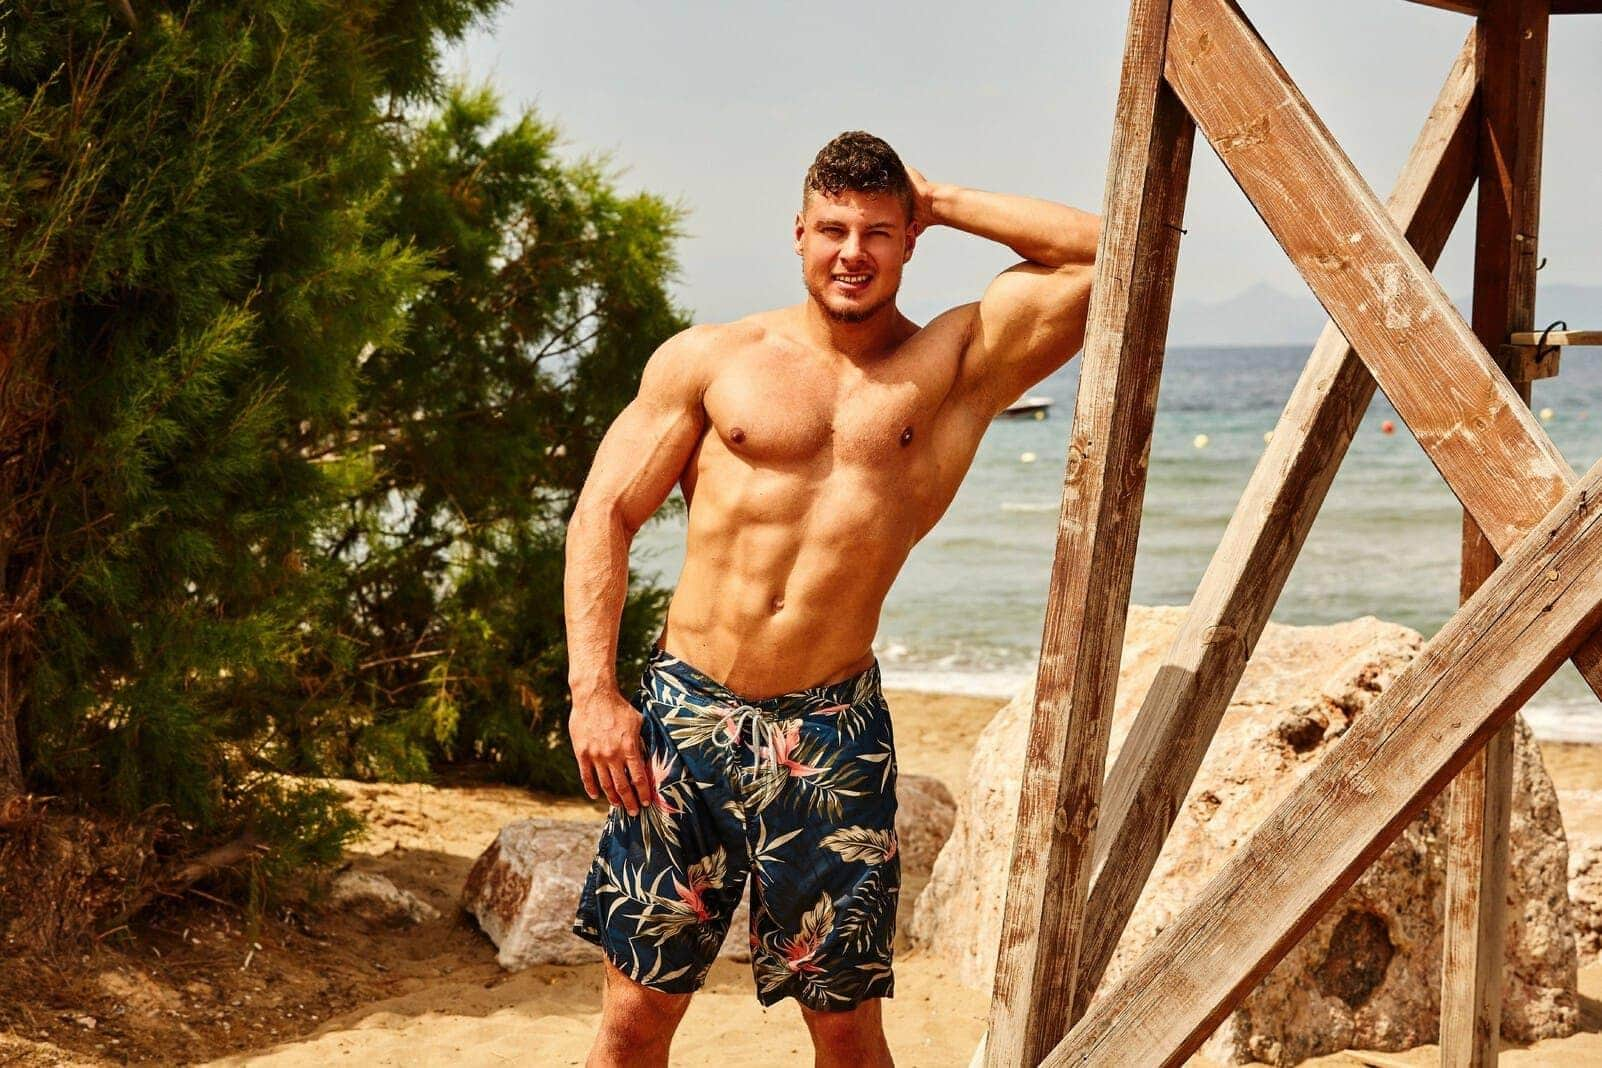 Bachelorette-Kandidat Yannic Oberkörper Badehose nackt Muskeln